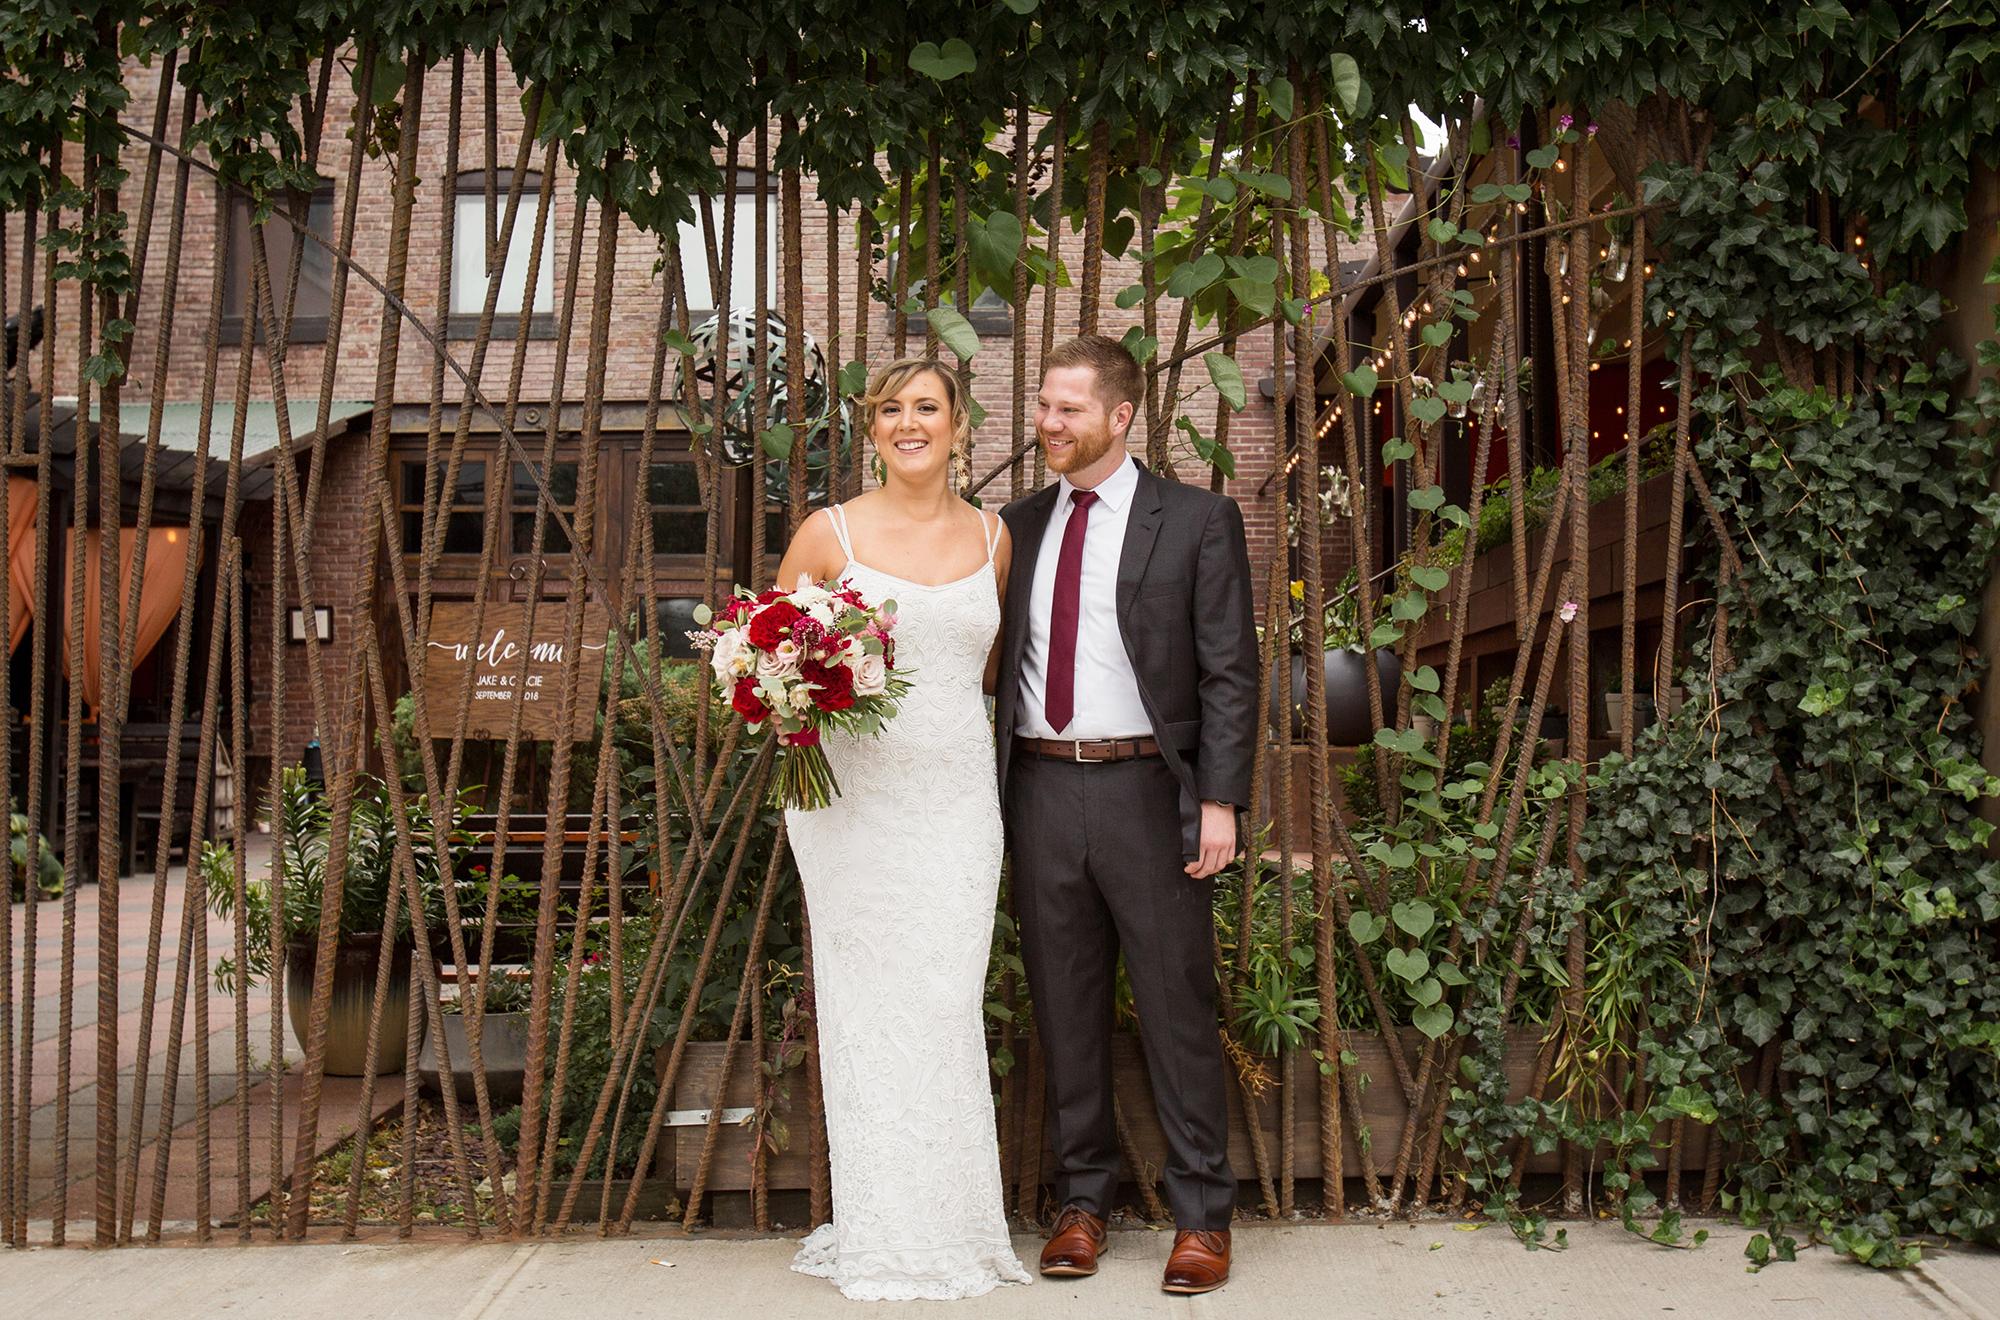 Julep-Belle-Wedding-Photography-Los-Angeles-Grace-Jake-08.jpg